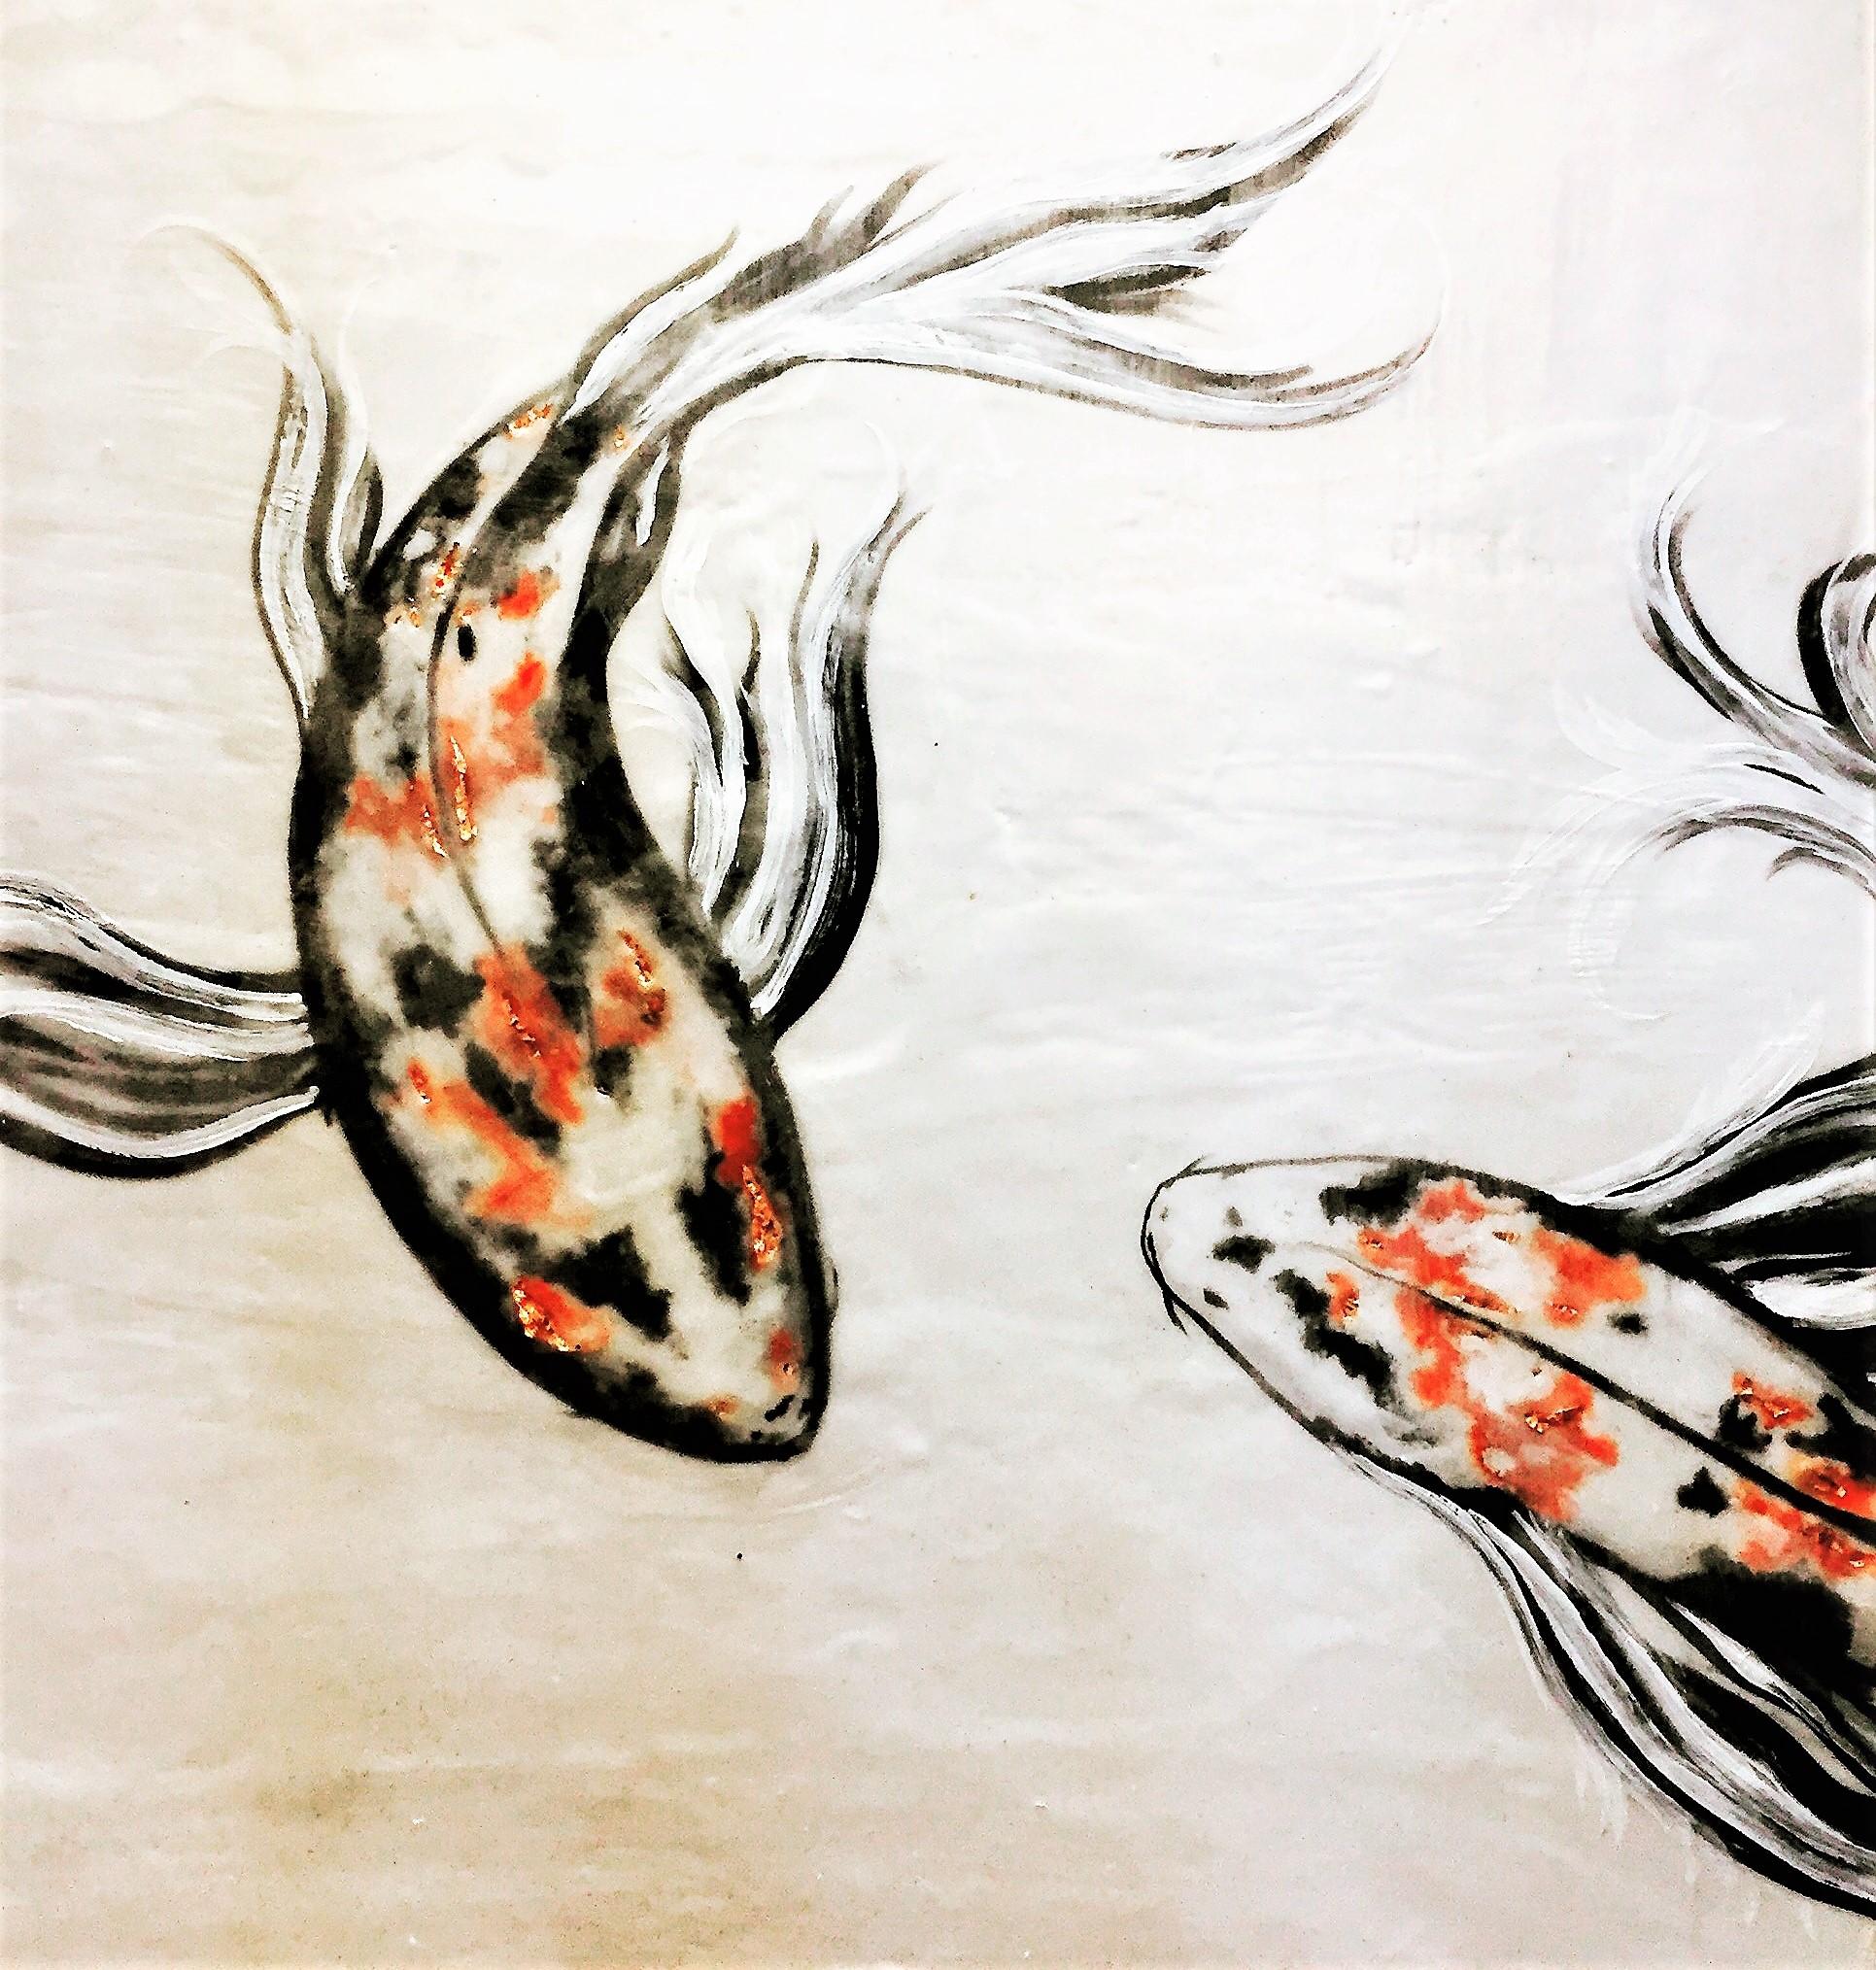 KOI FISH 2.jpg